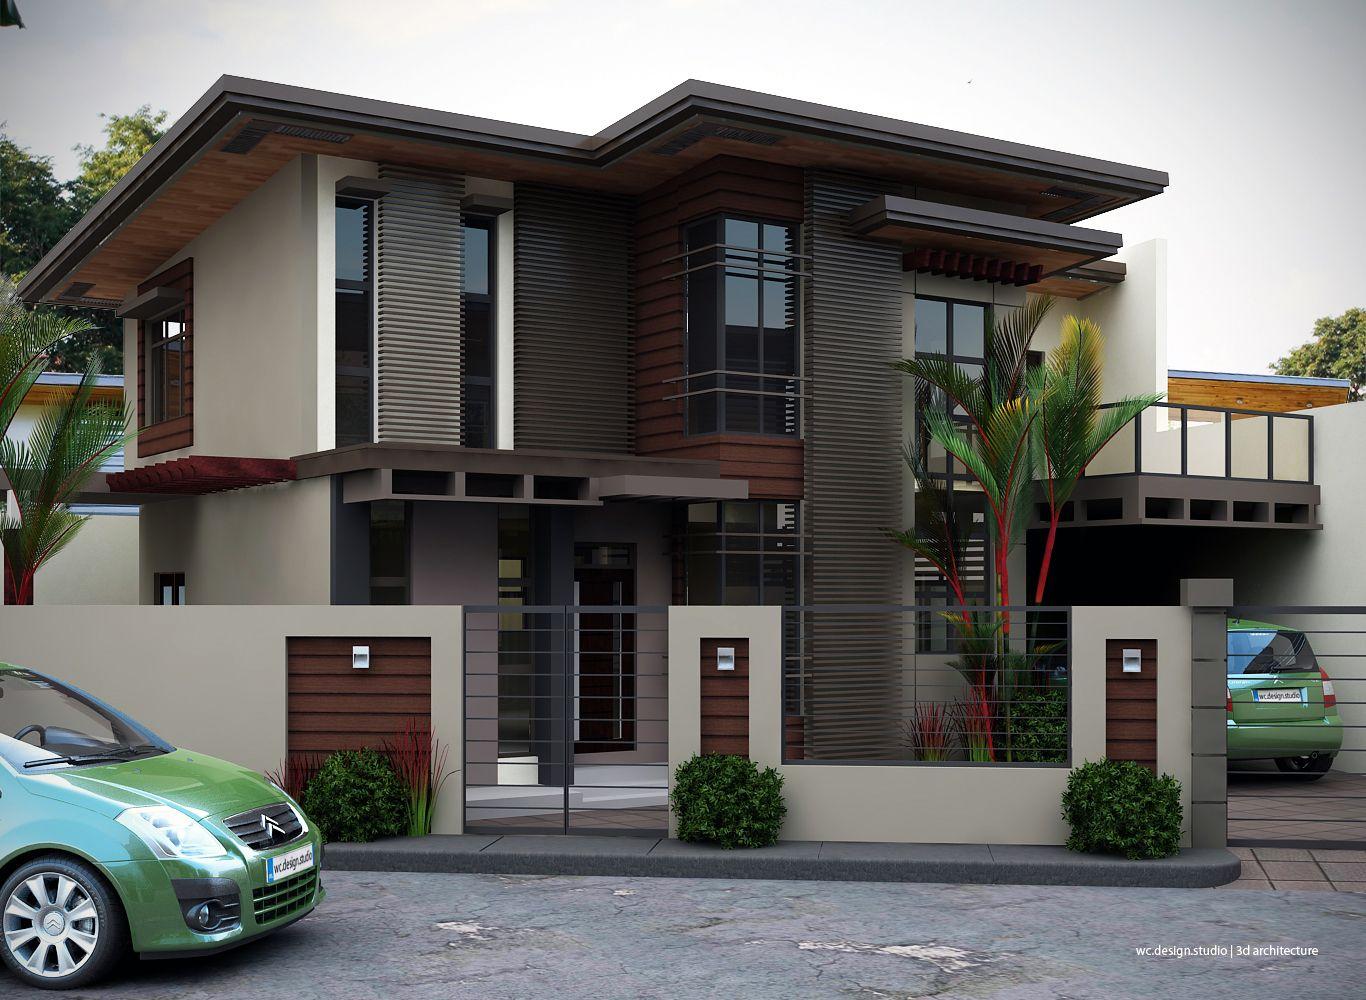 Proposed Double Storey House Amazing Architecture